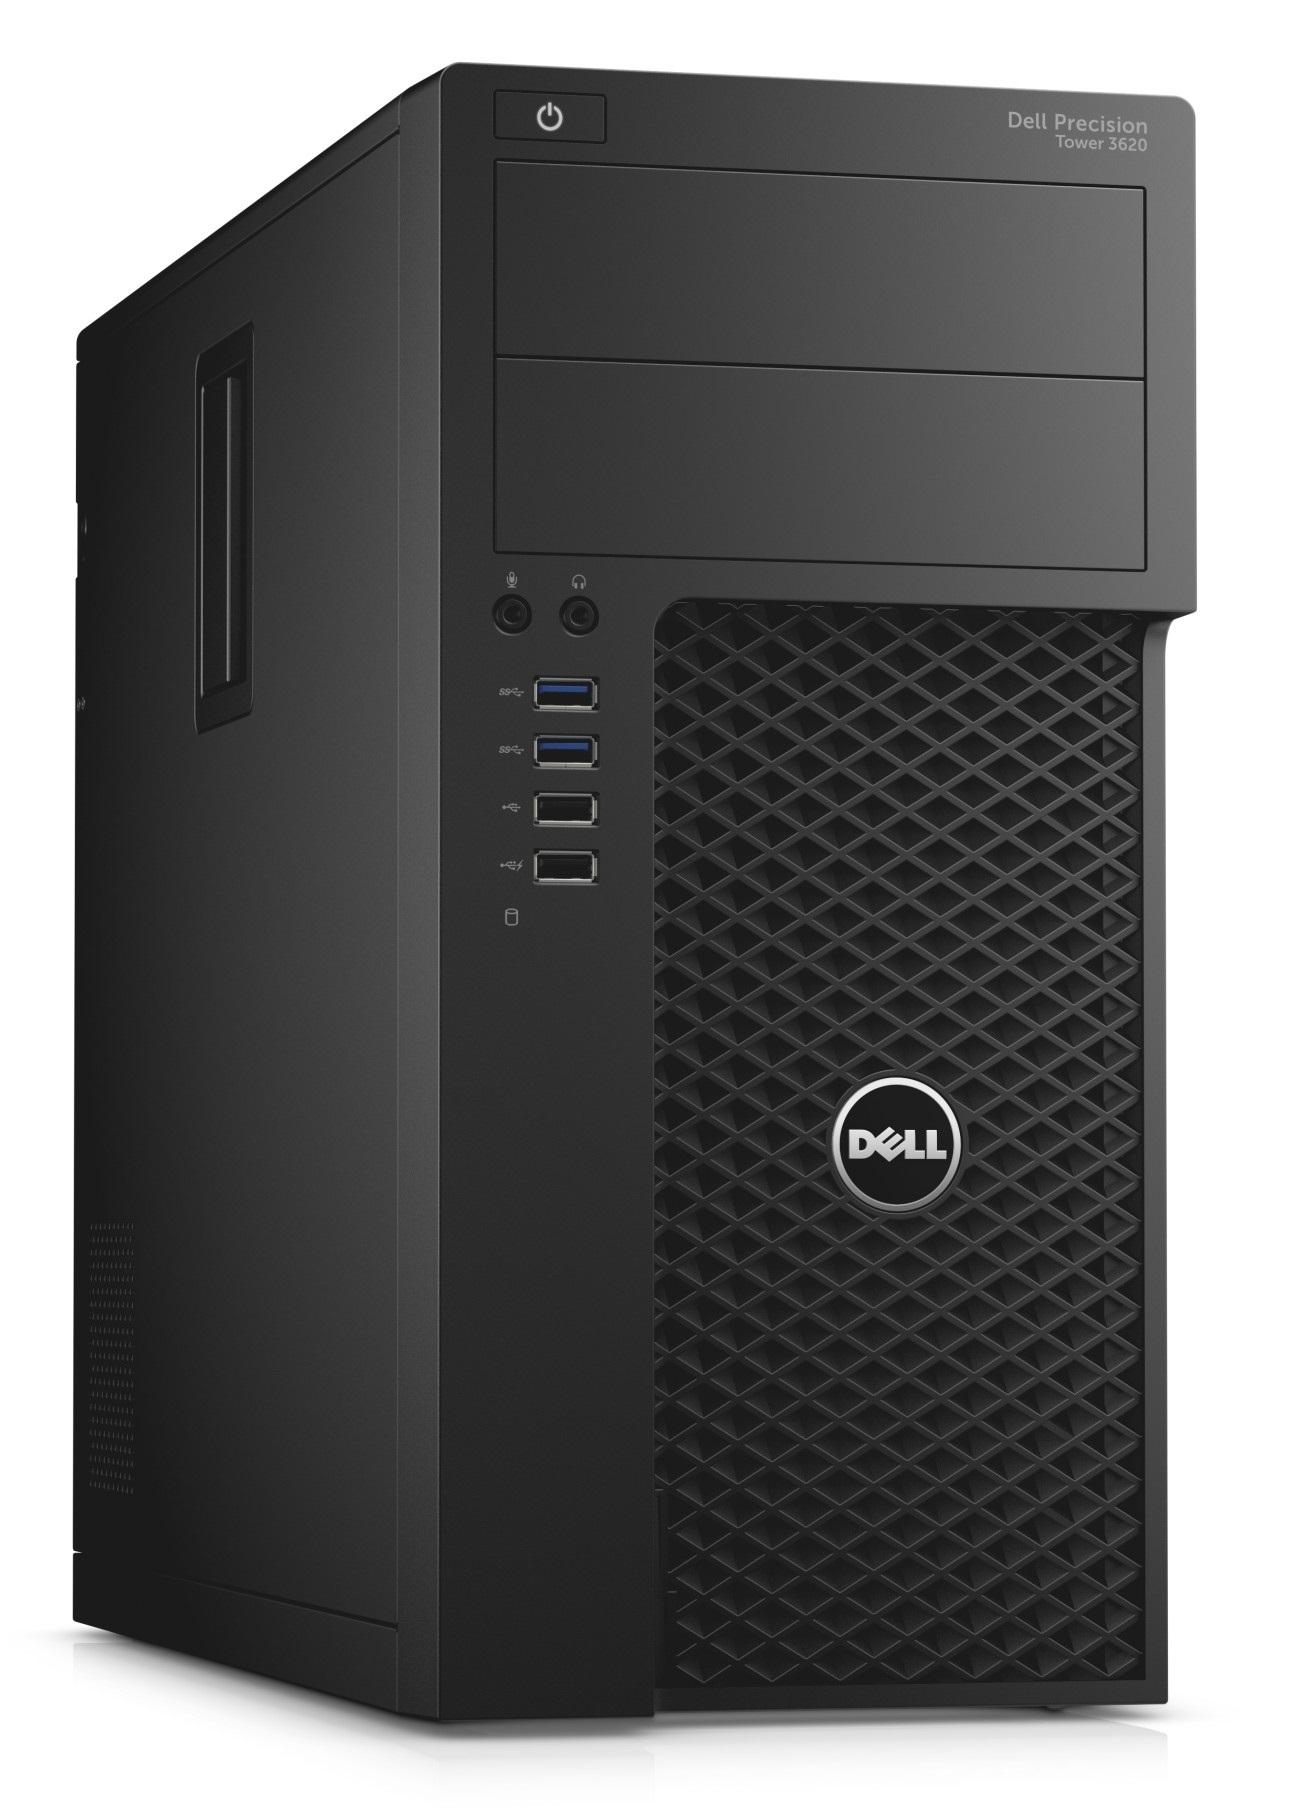 Dell Precision T3620 MT i7-6700/16G/256SSD/P2000-5G/DP/W10P/3R NBD